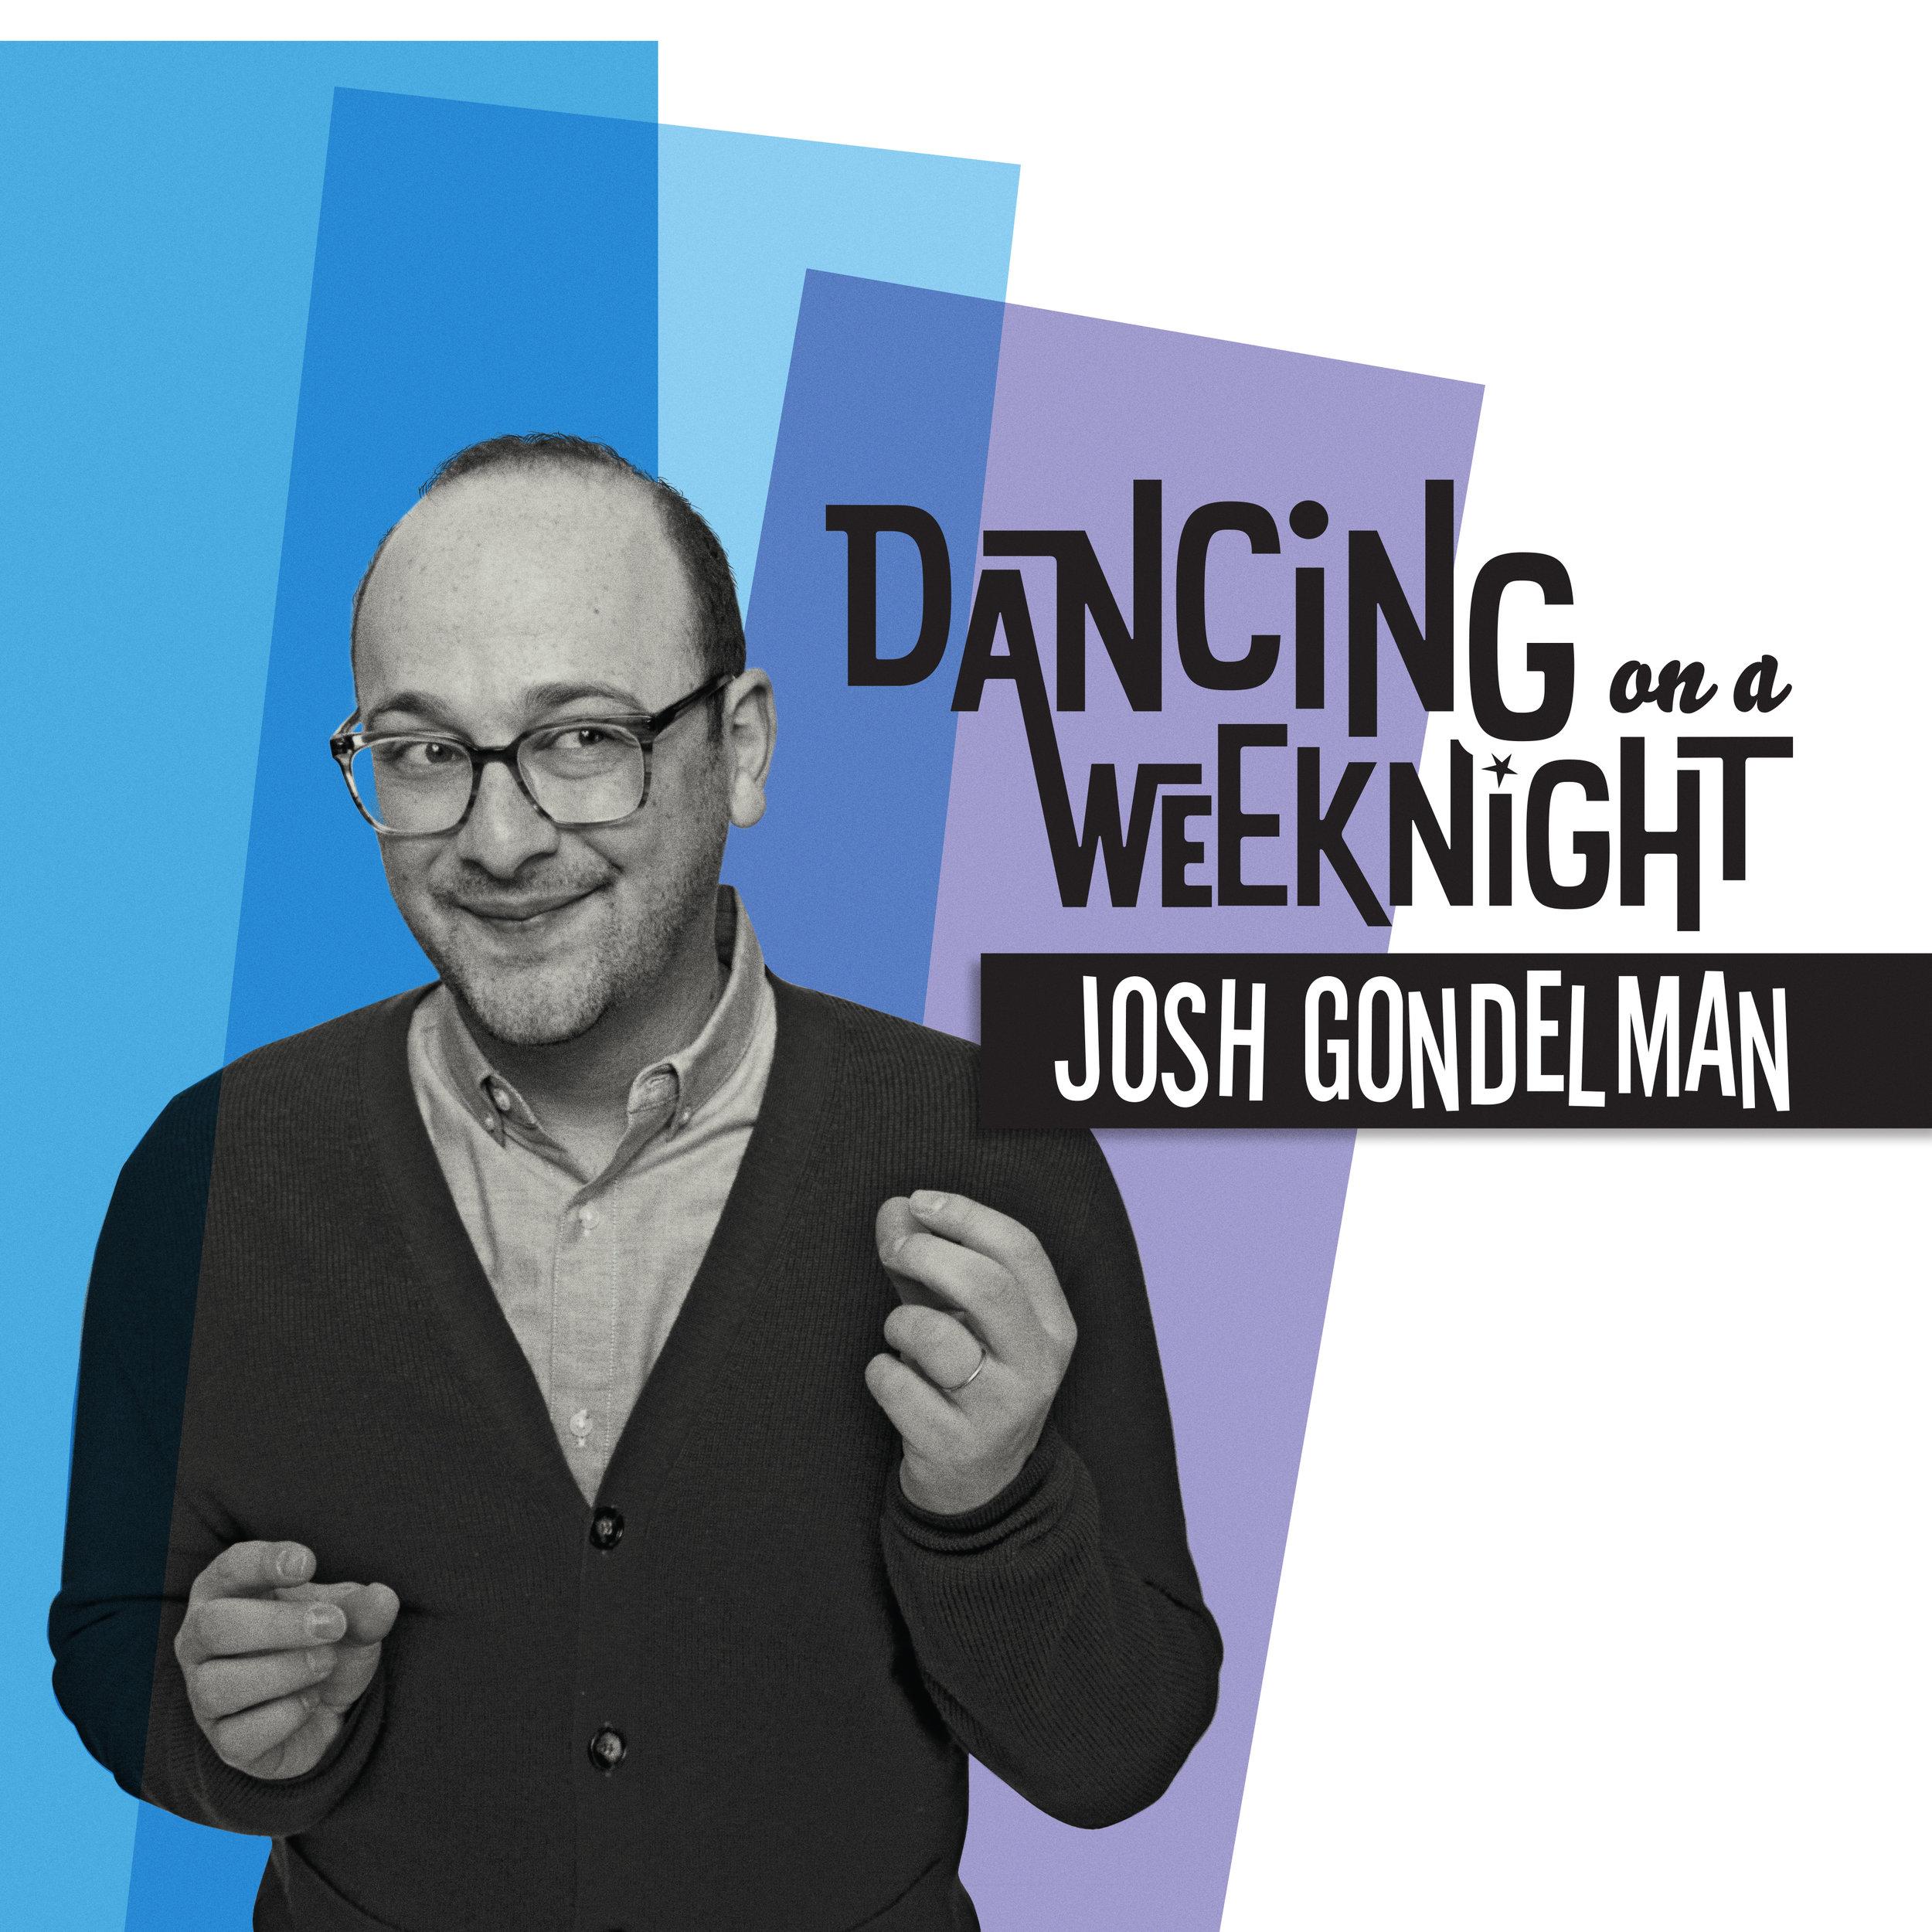 Dancing_on_a_Weeknight_Digital_Art.jpg